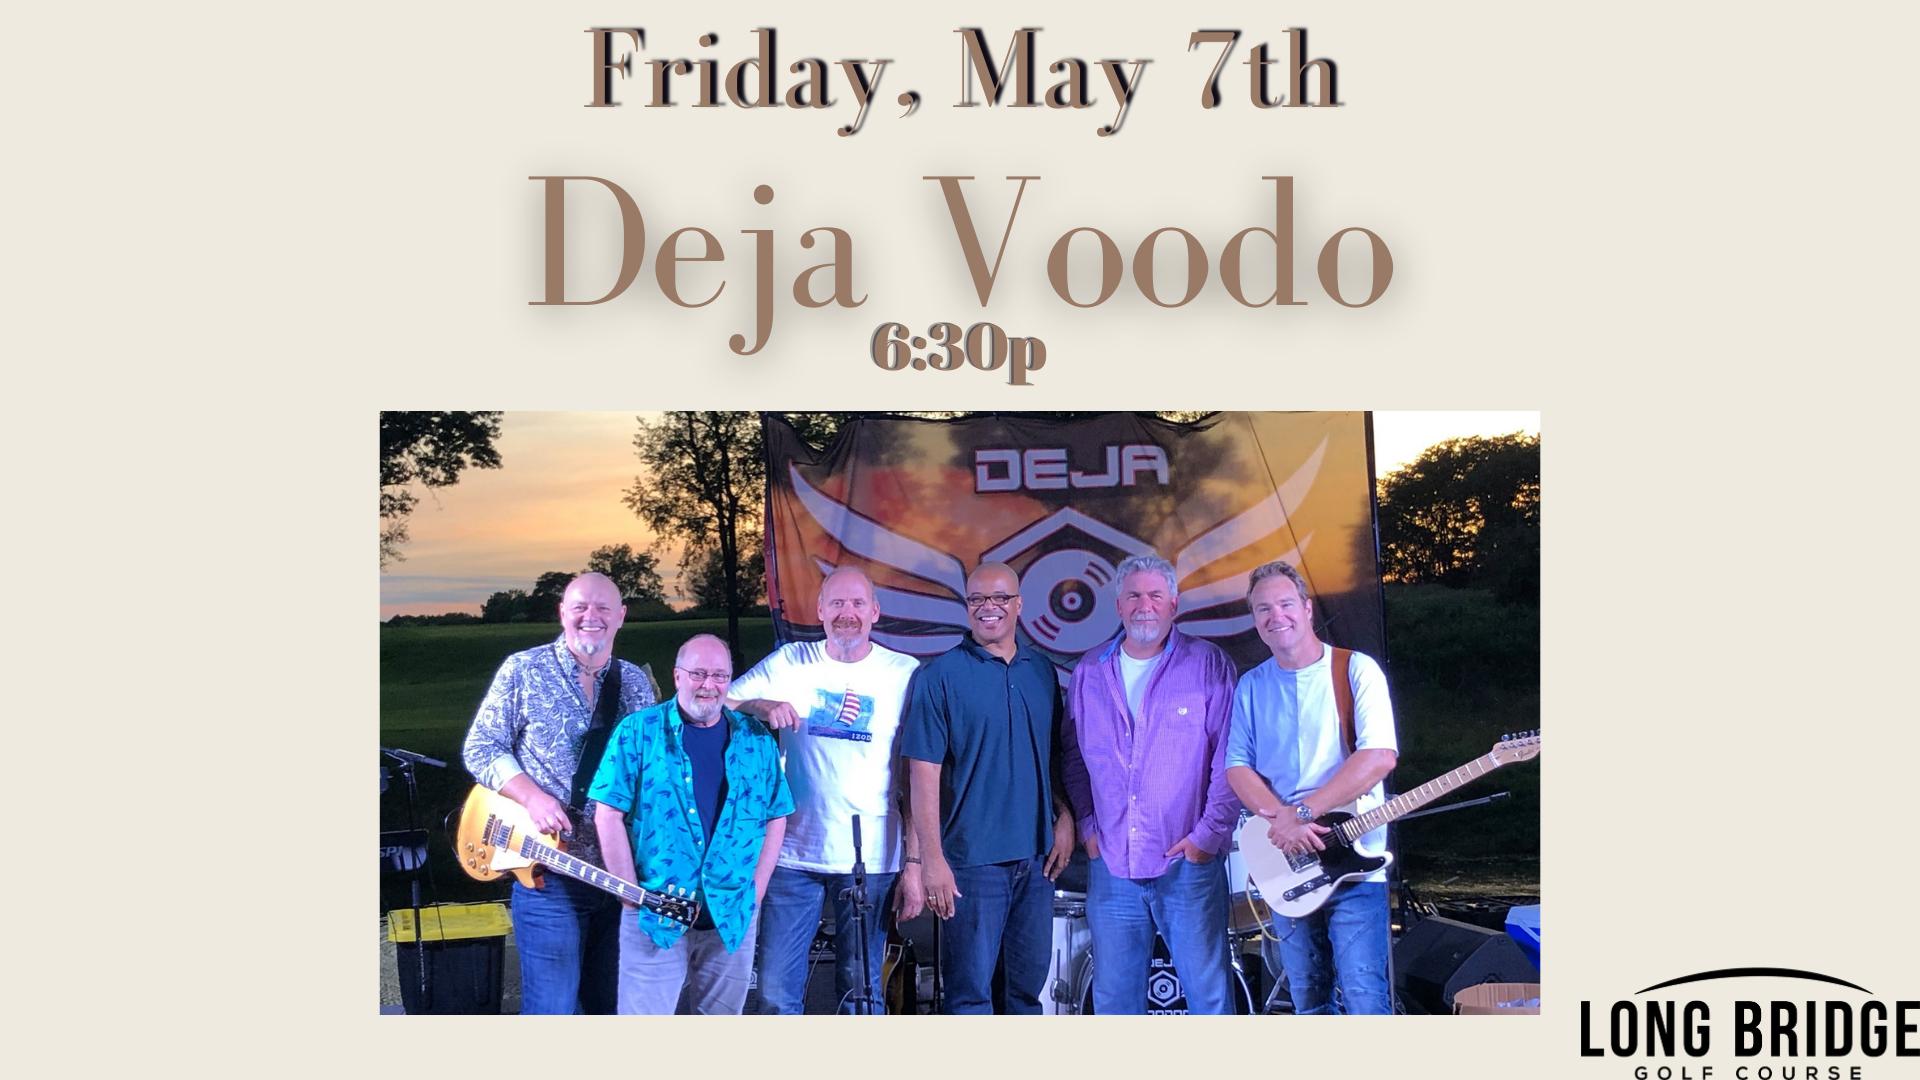 LBGC Deja Voodo Friday, May 7th.png